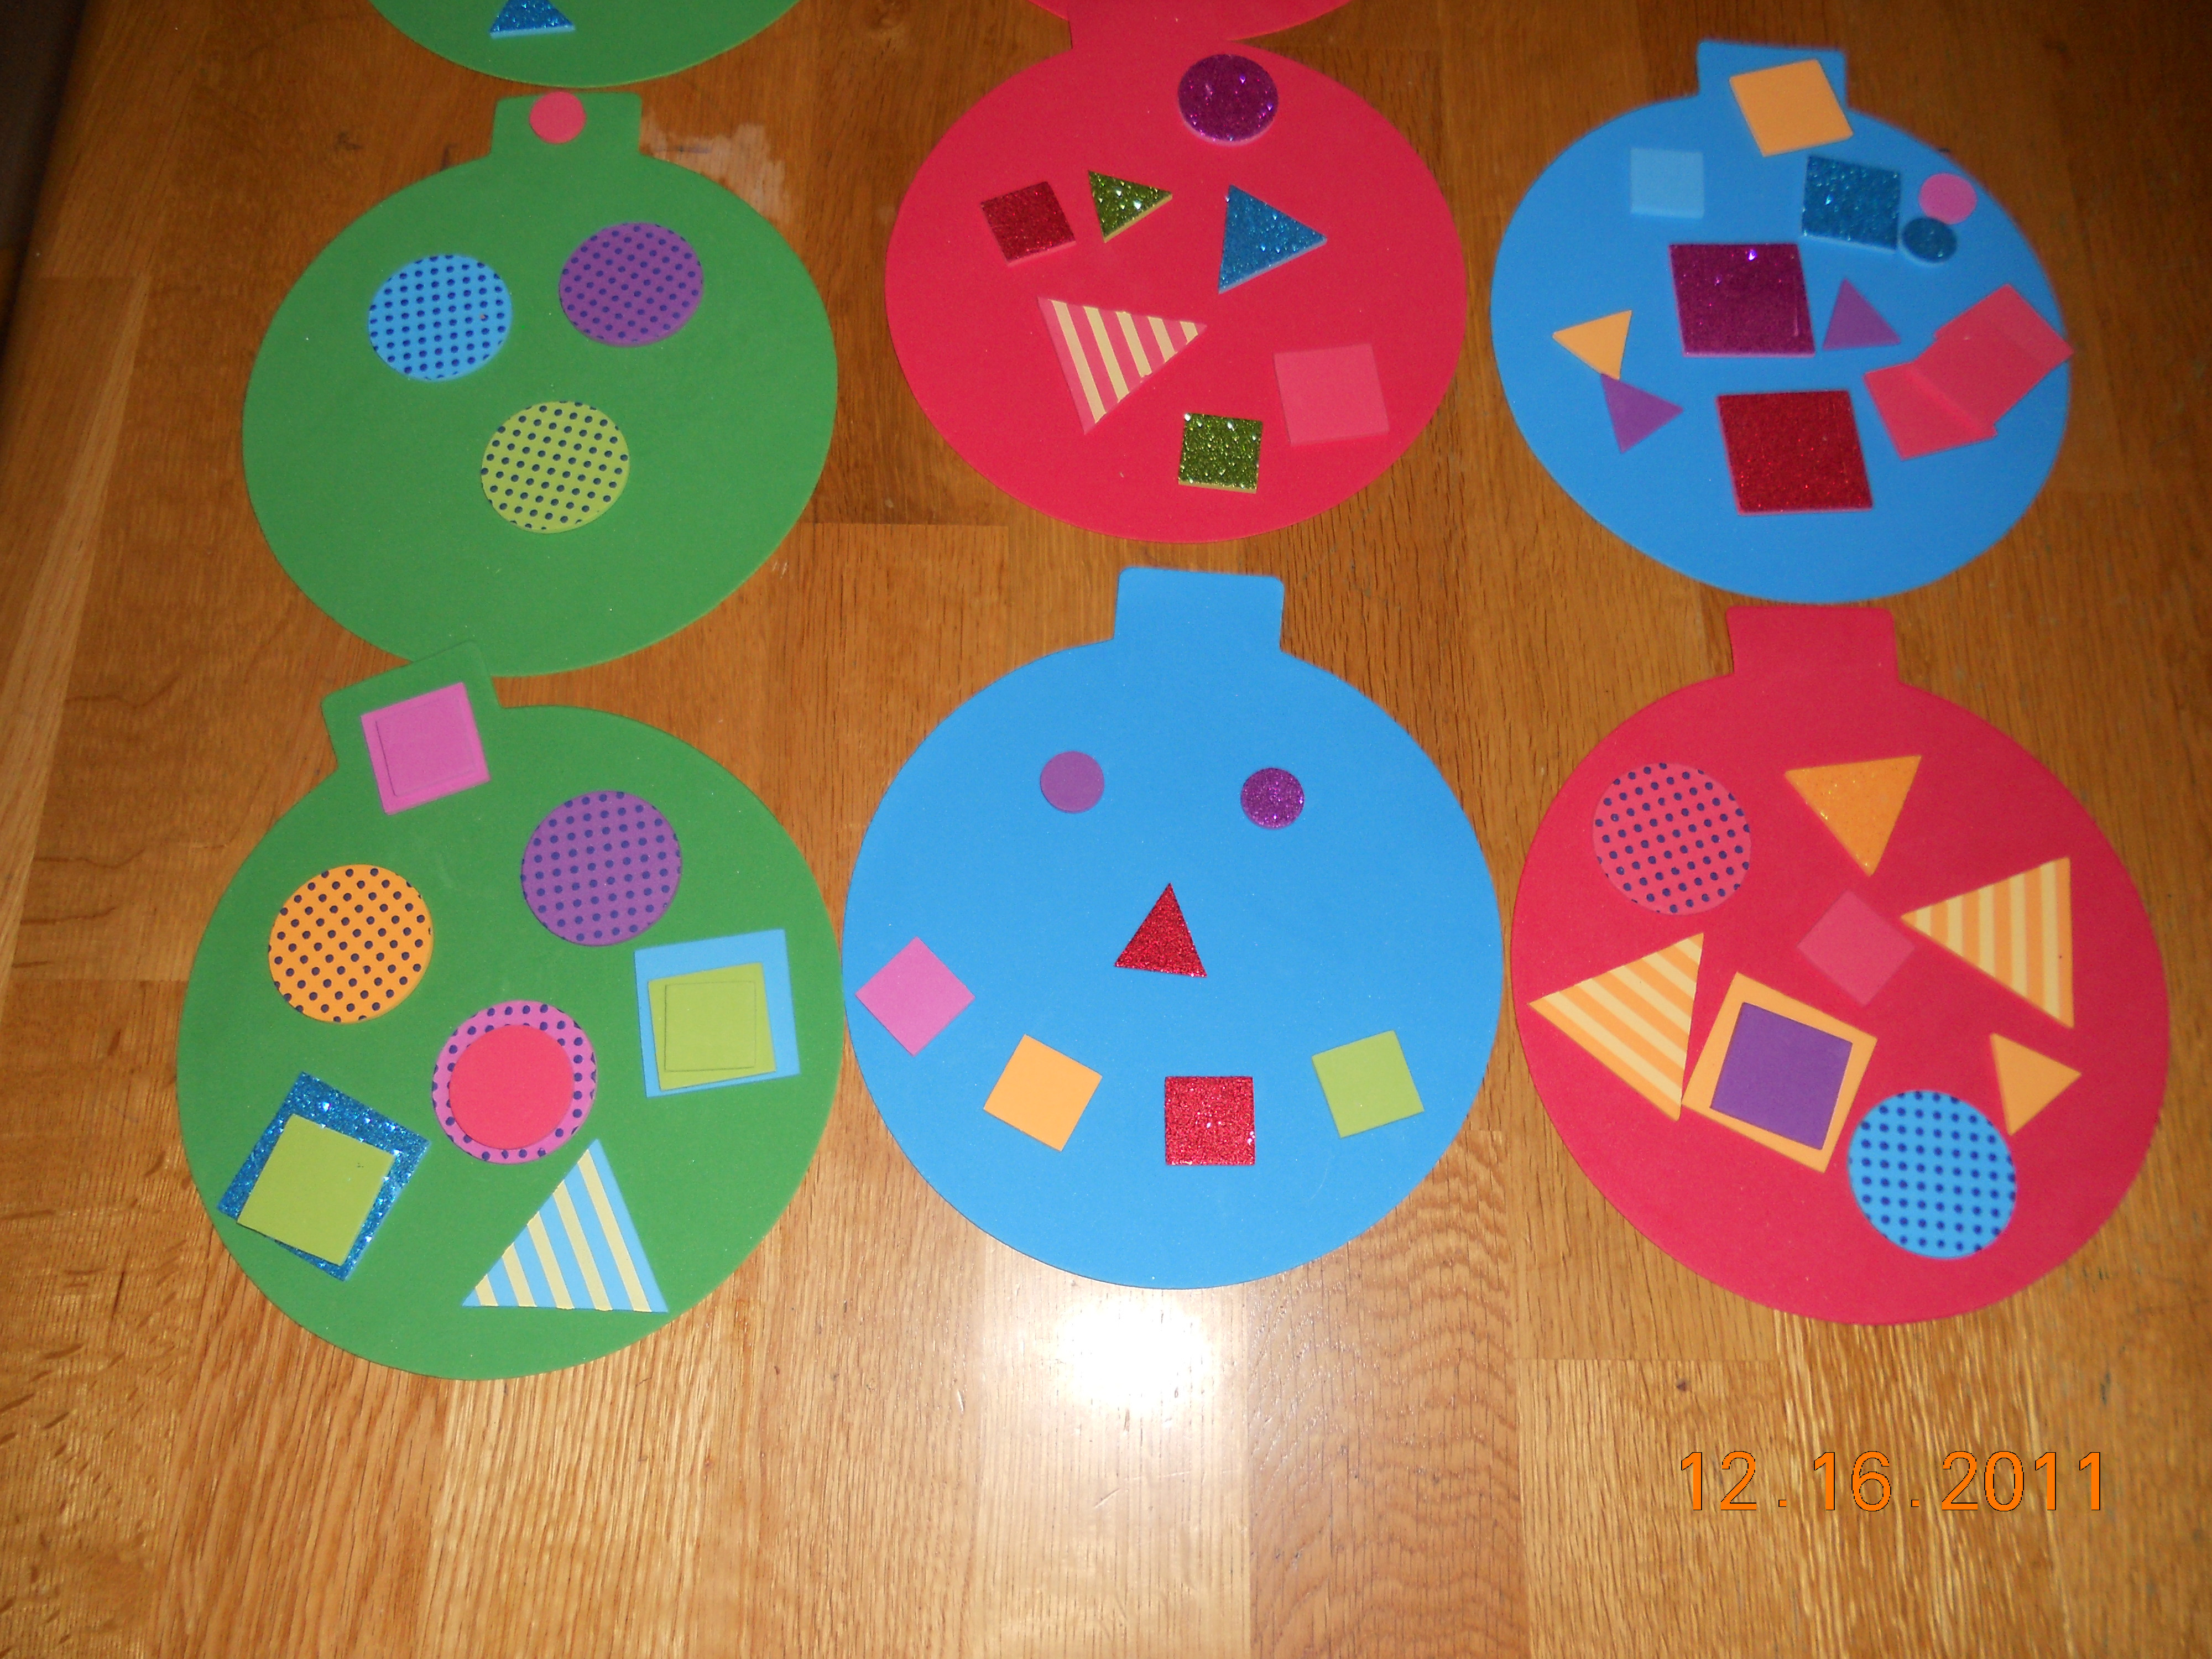 Christmas Craft Ideas For Pre School  Preschool Crafts for Kids Easy Christmas Ornament Craft